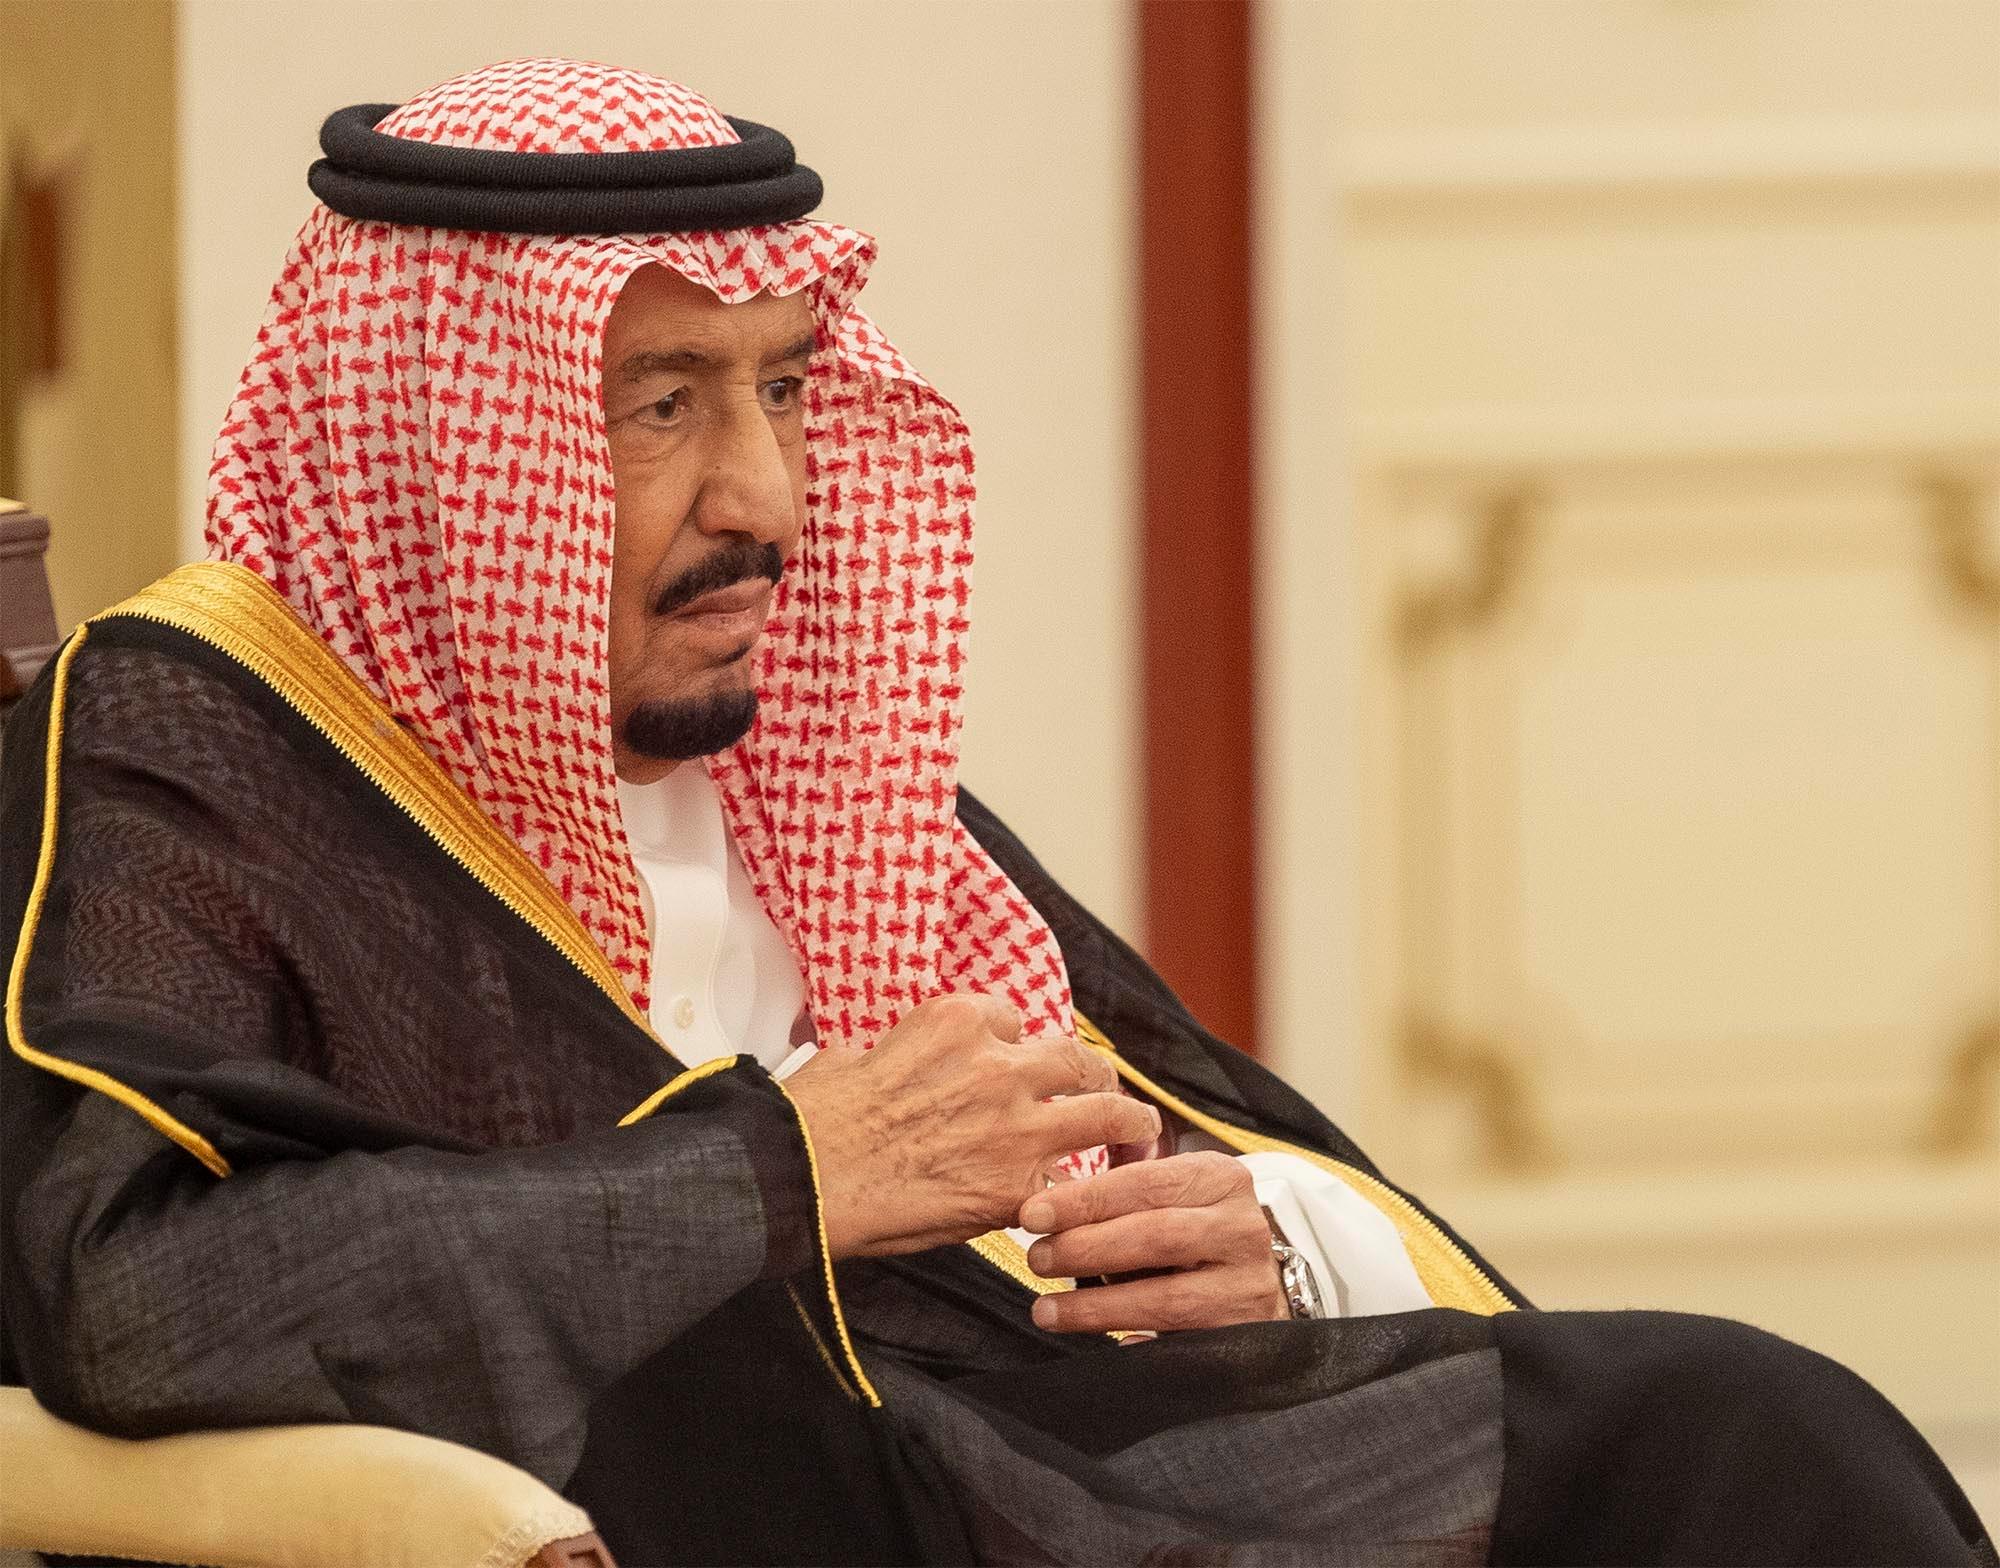 Saudi king says kingdom is capable of responding to attacks